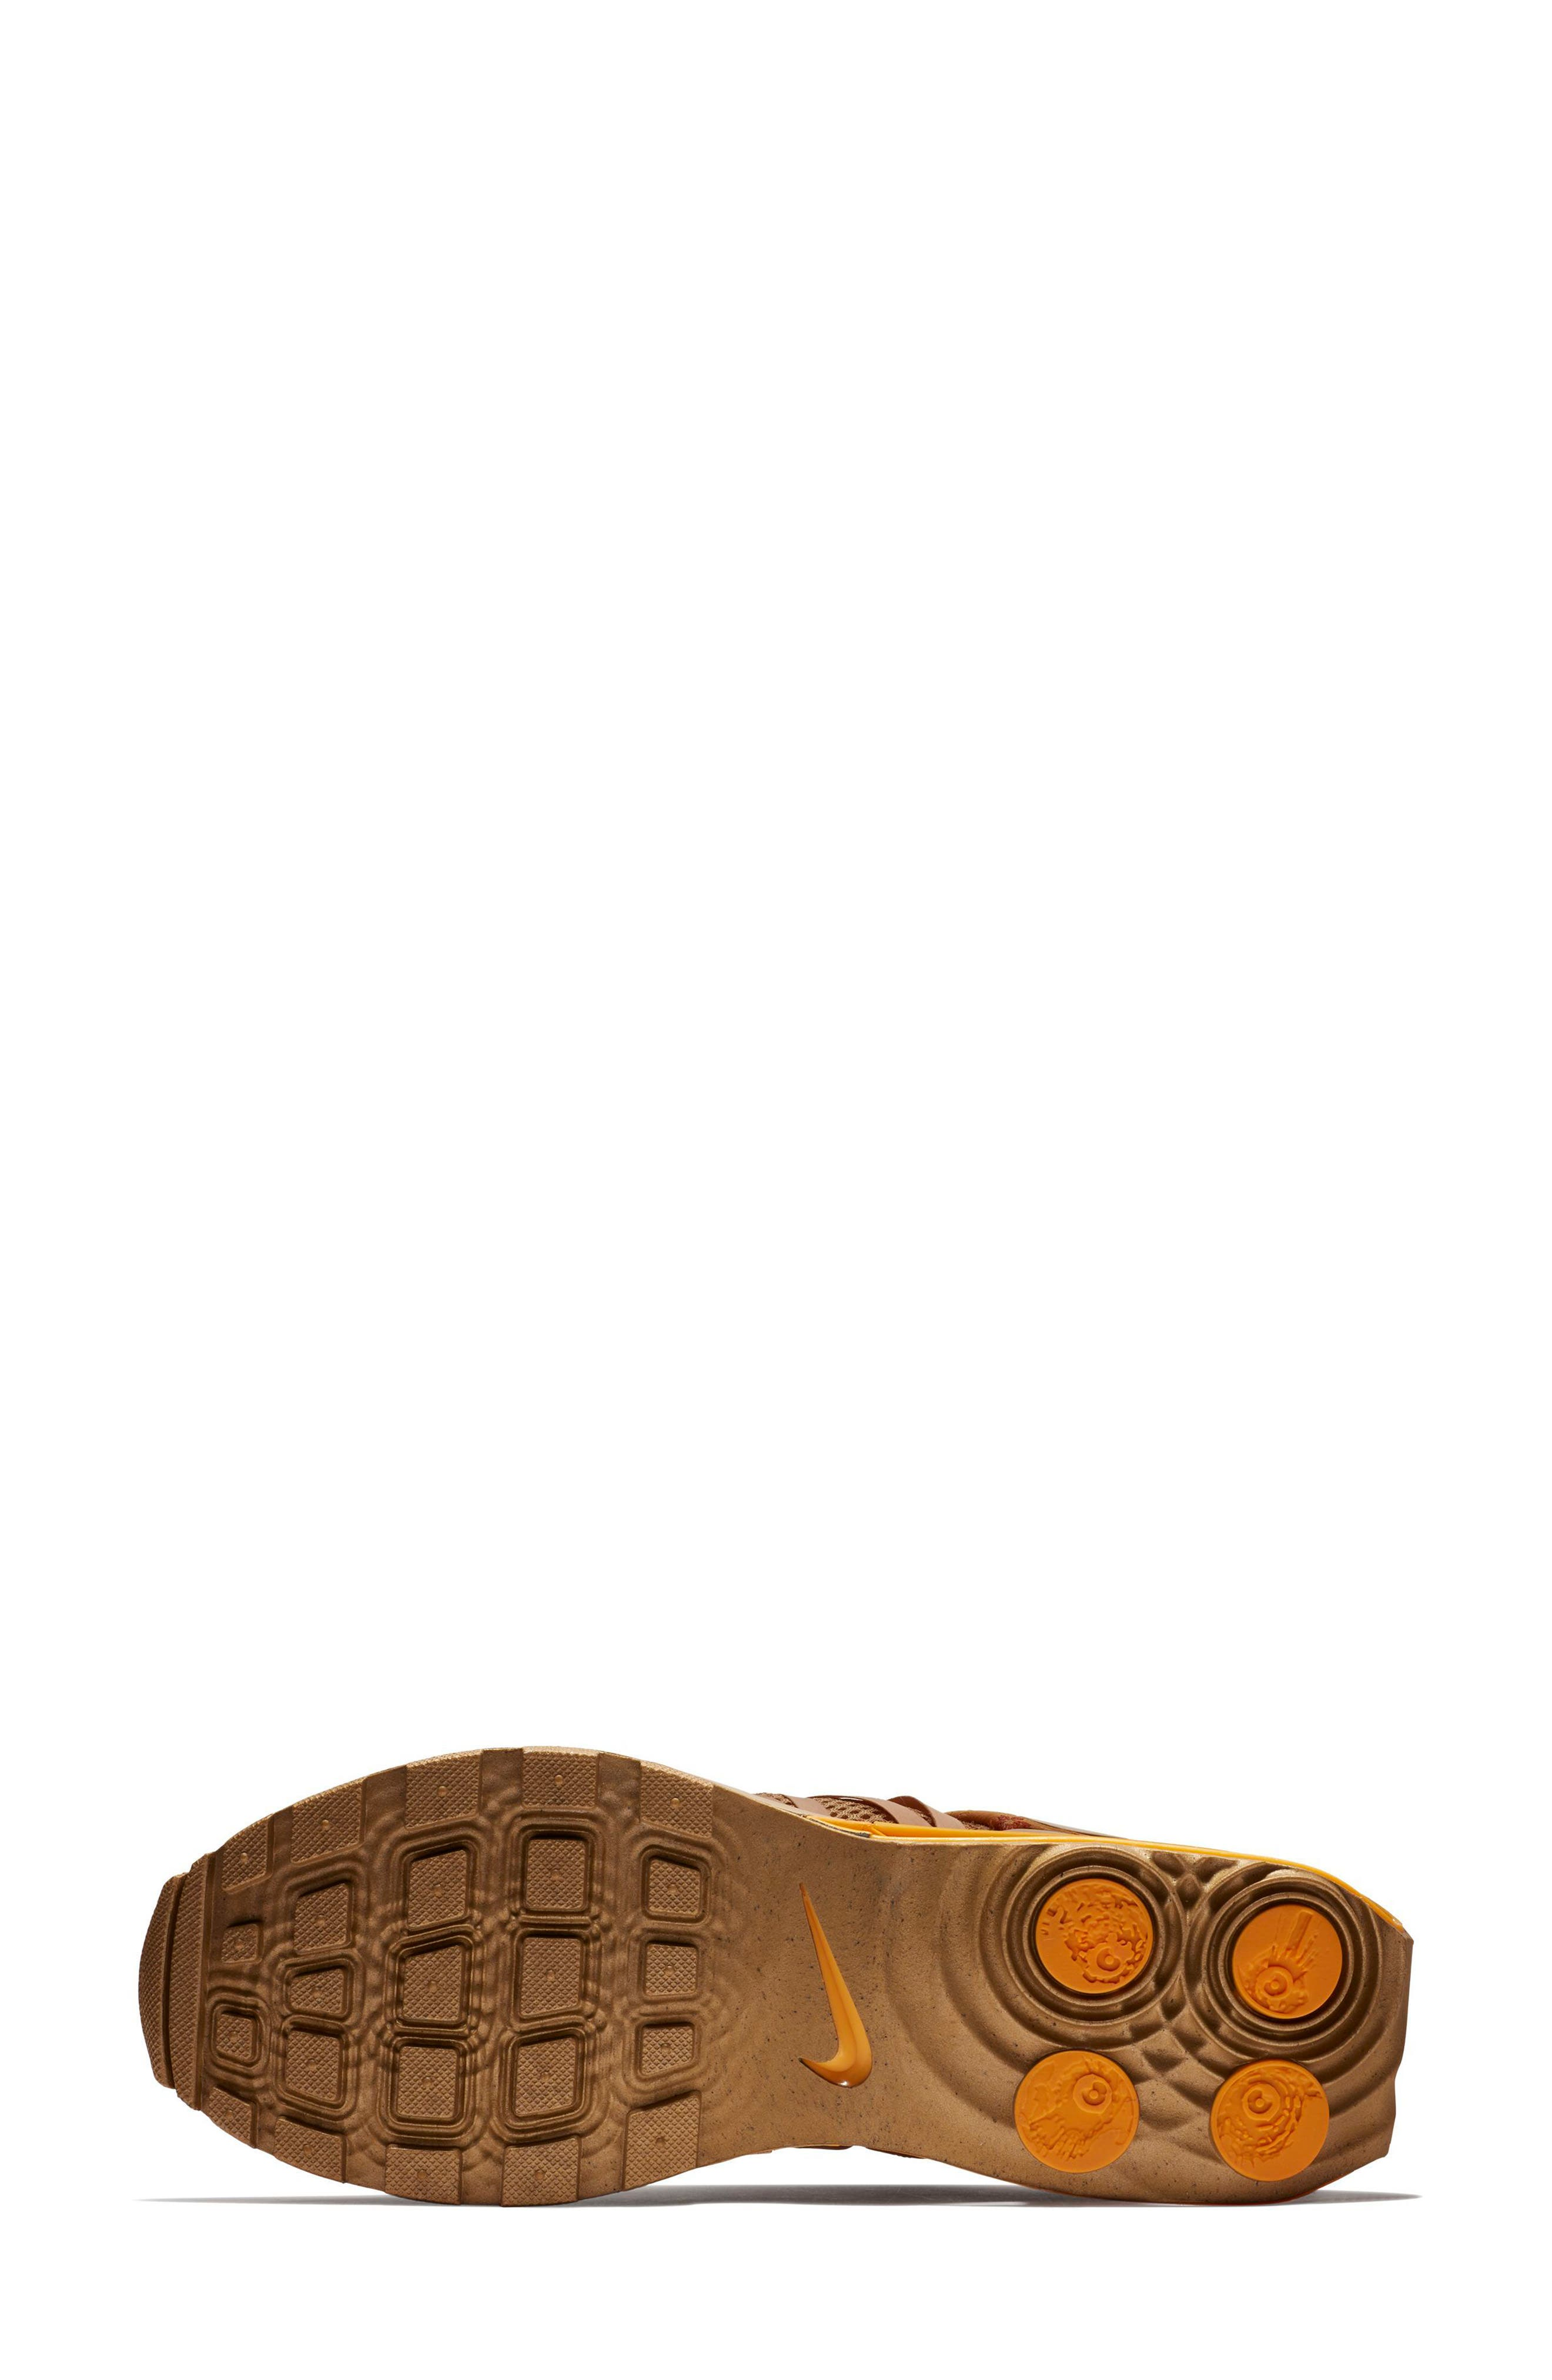 Shox Gravity Sneaker,                             Alternate thumbnail 5, color,                             Metallic Gold/ Metallic Gold